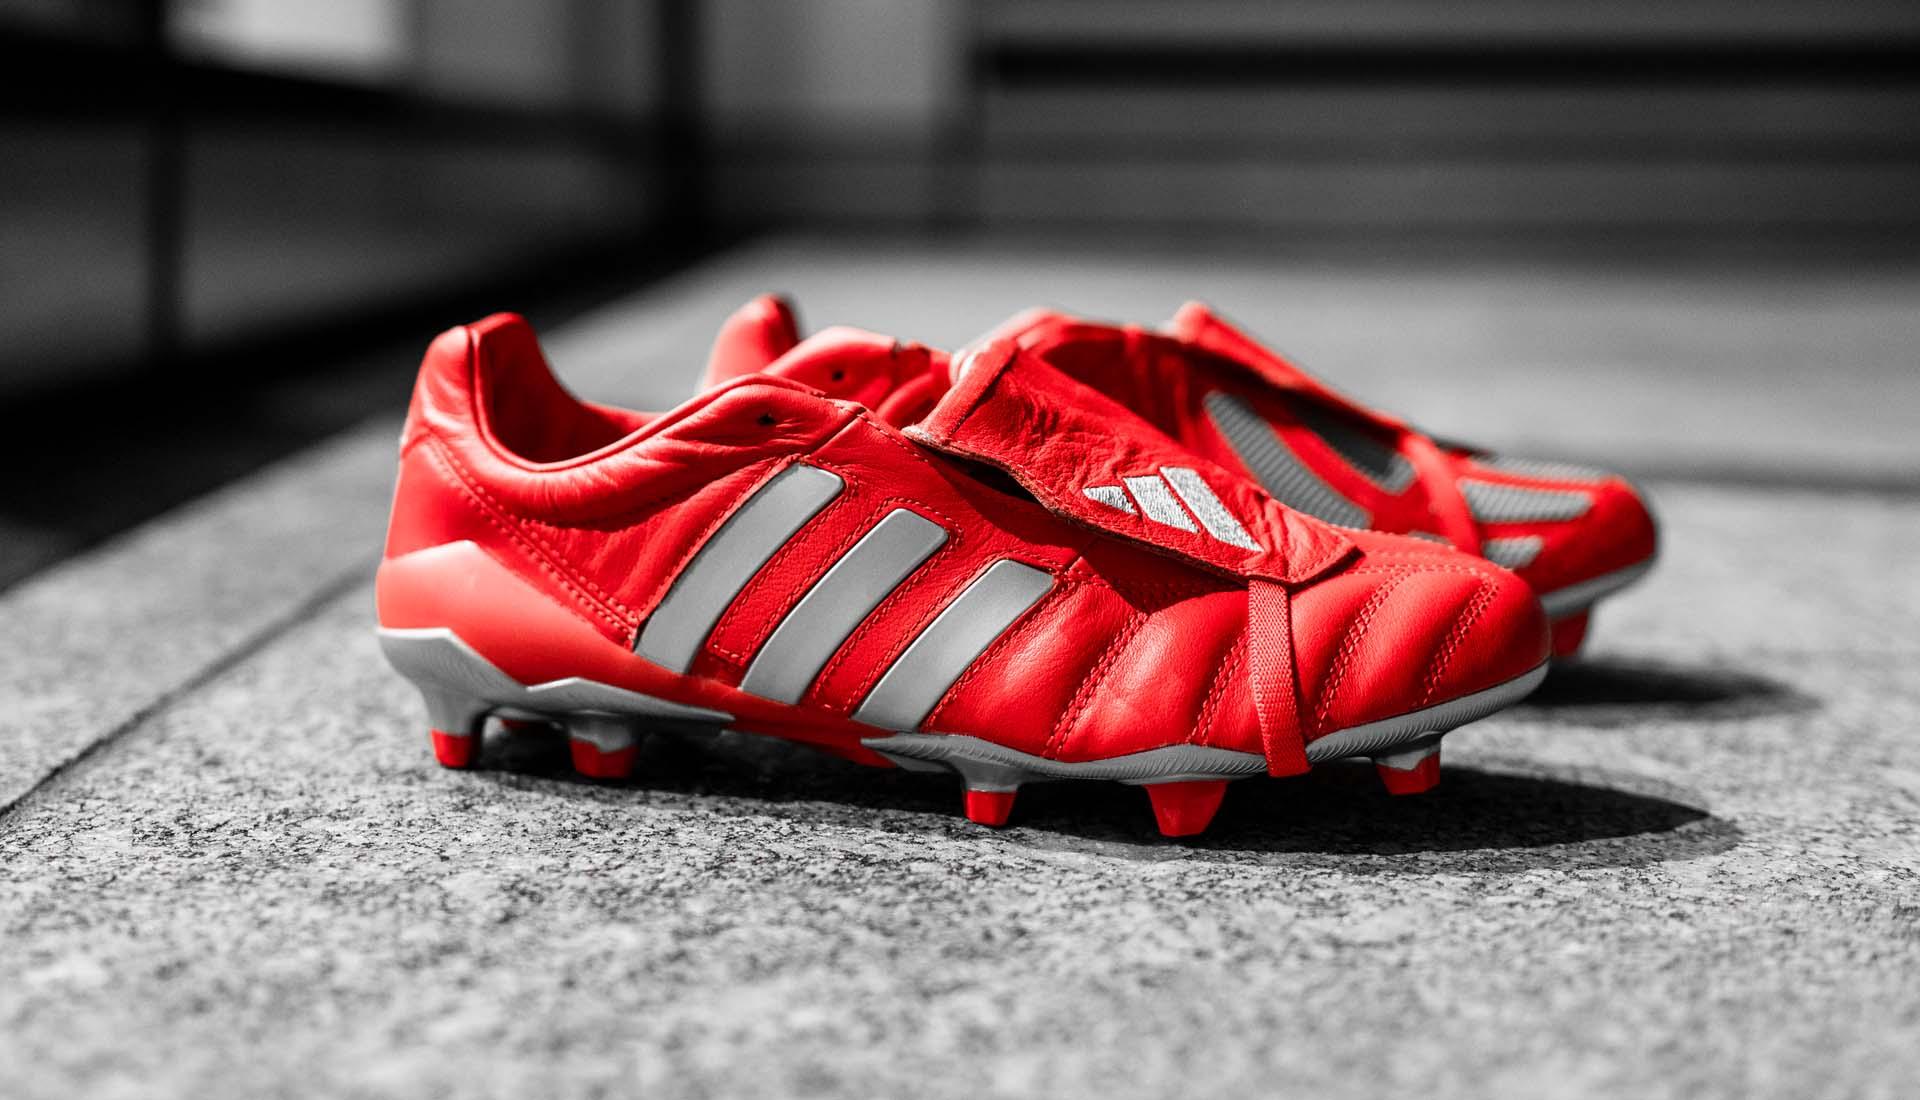 Predator Mania Re-Make Football Boots